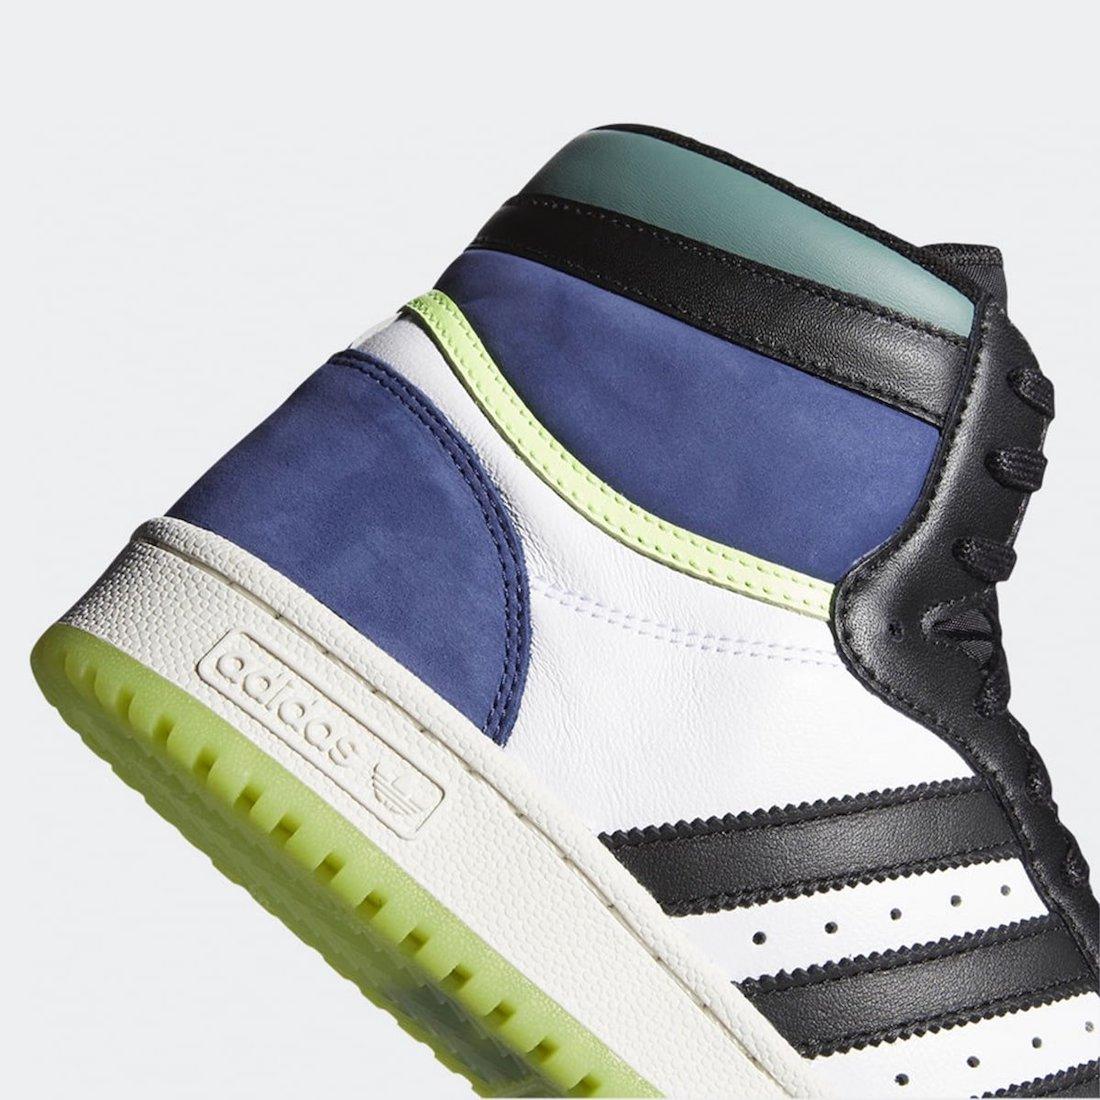 Donovan Mitchell adidas Top Ten Hi GW4978 Release Date Info